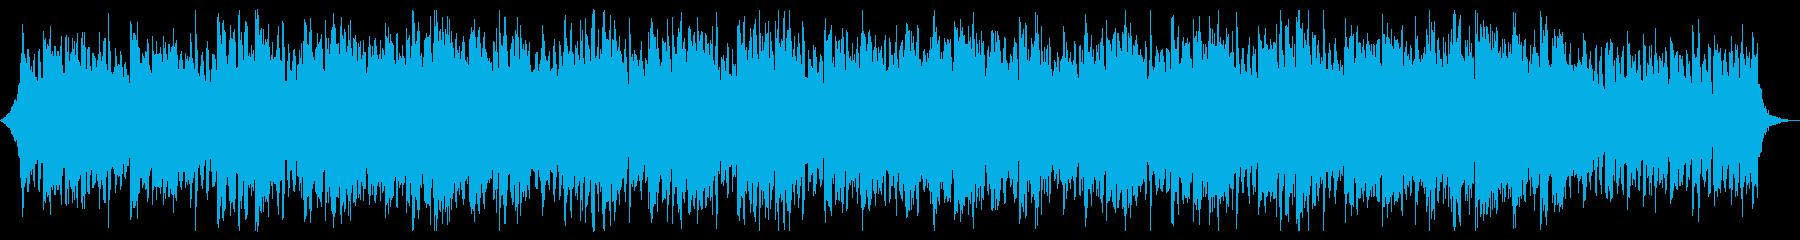 Transitionsの再生済みの波形